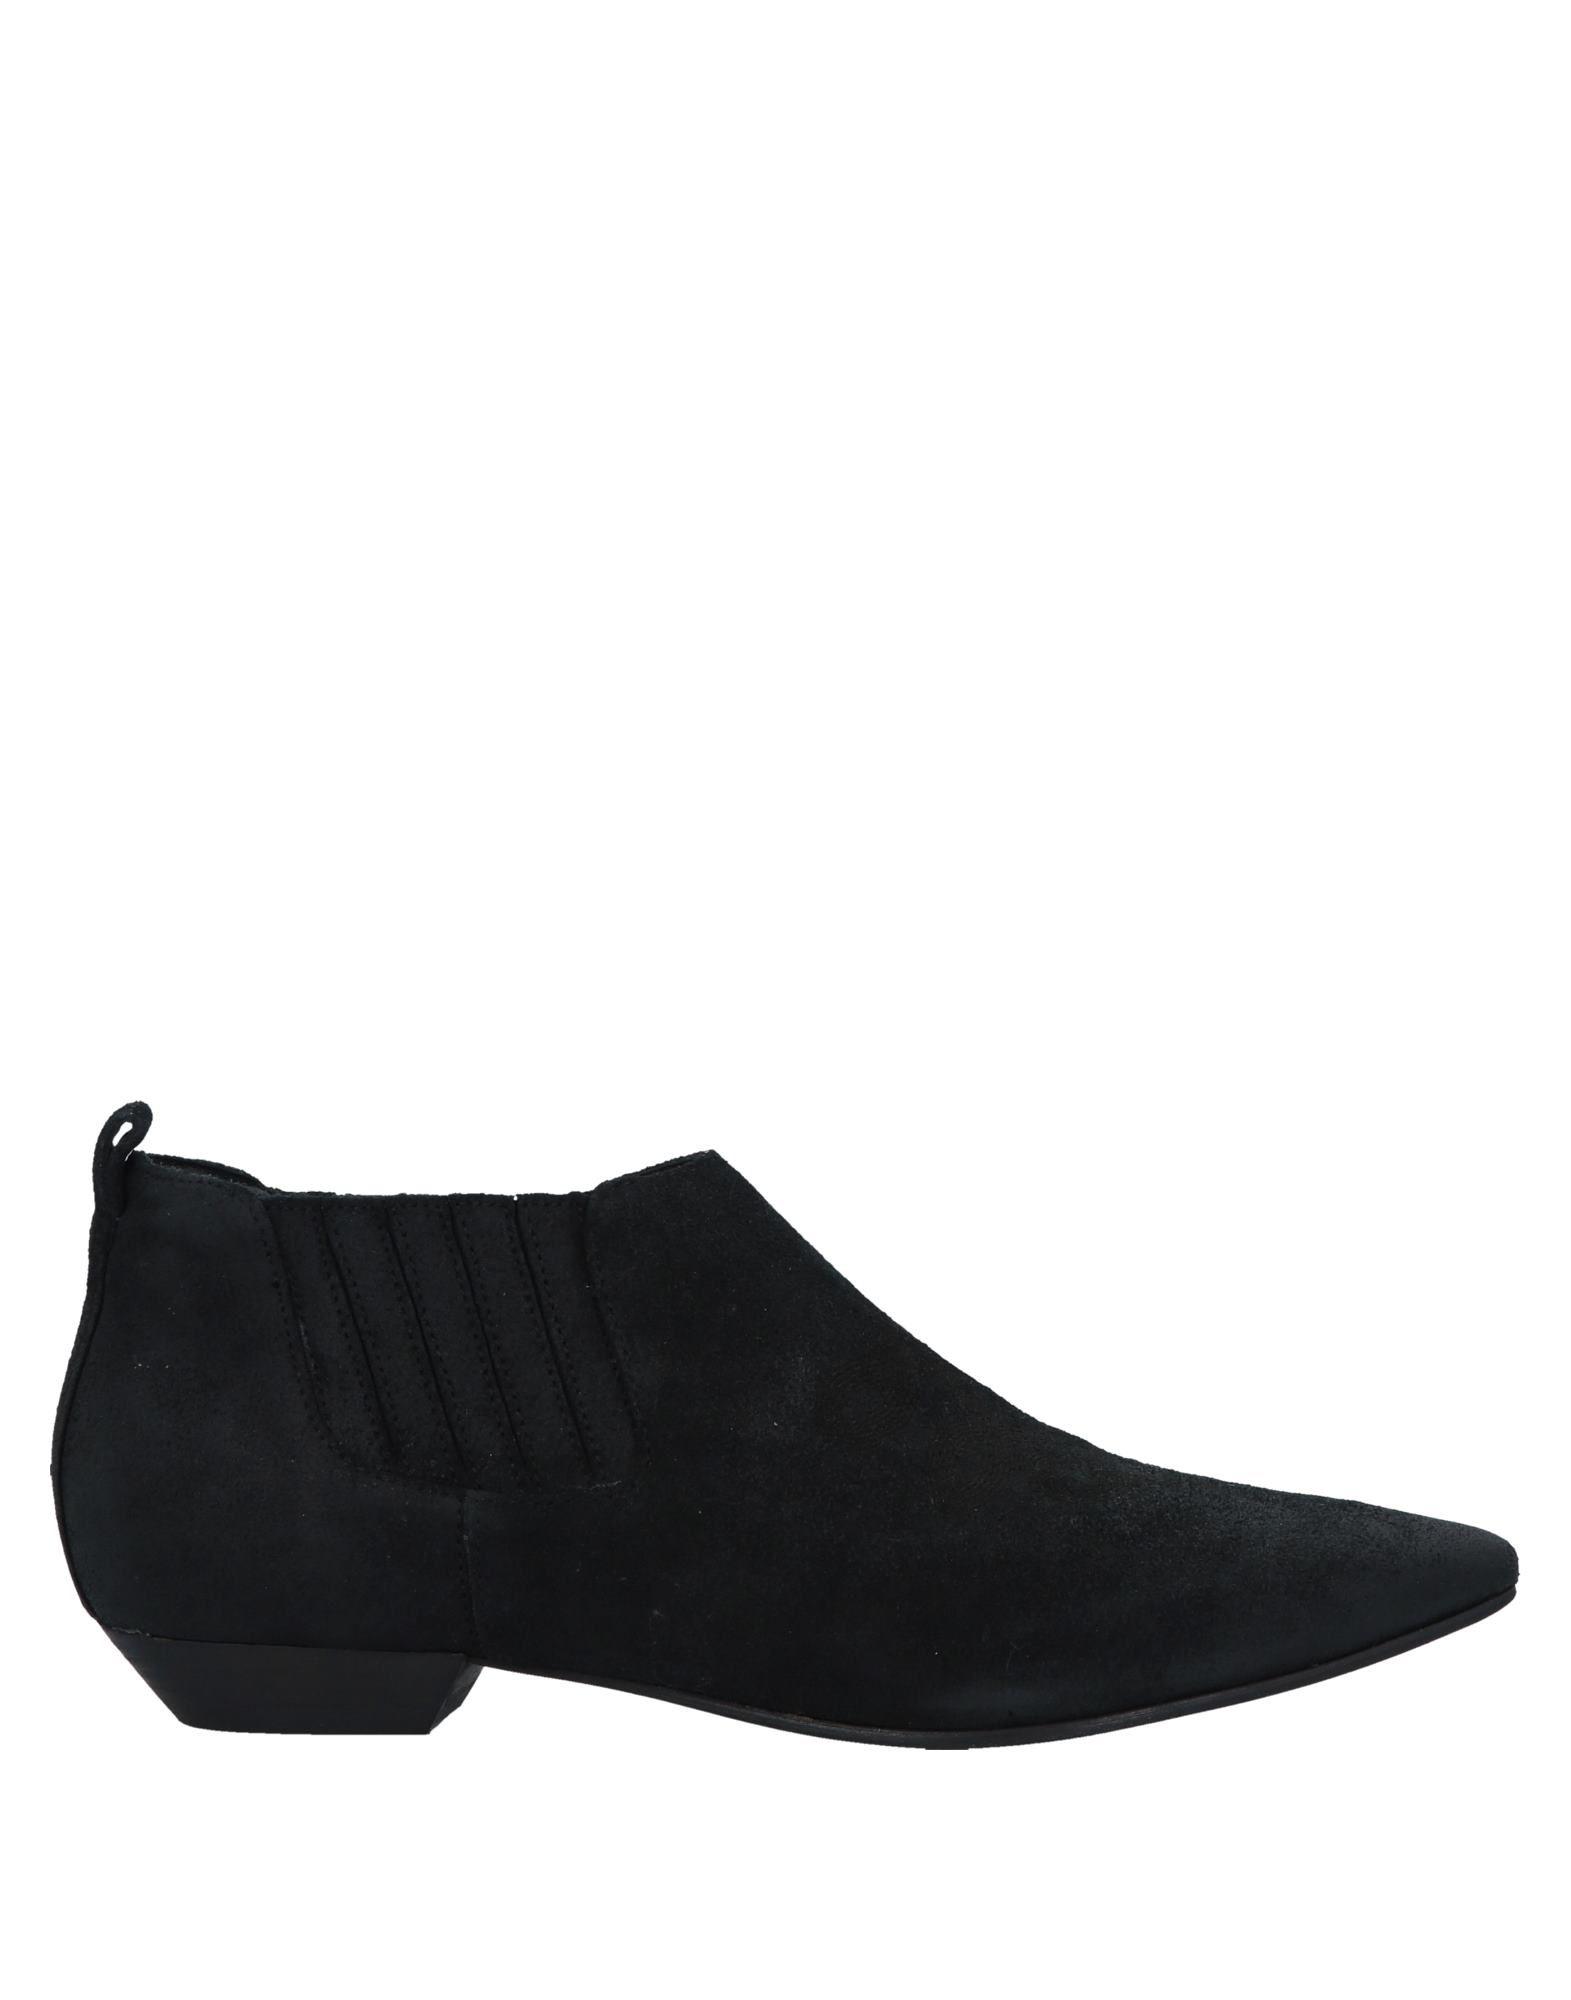 BELLE BY SIGERSON MORRISON Полусапоги и высокие ботинки belle by sigerson morrison мокасины